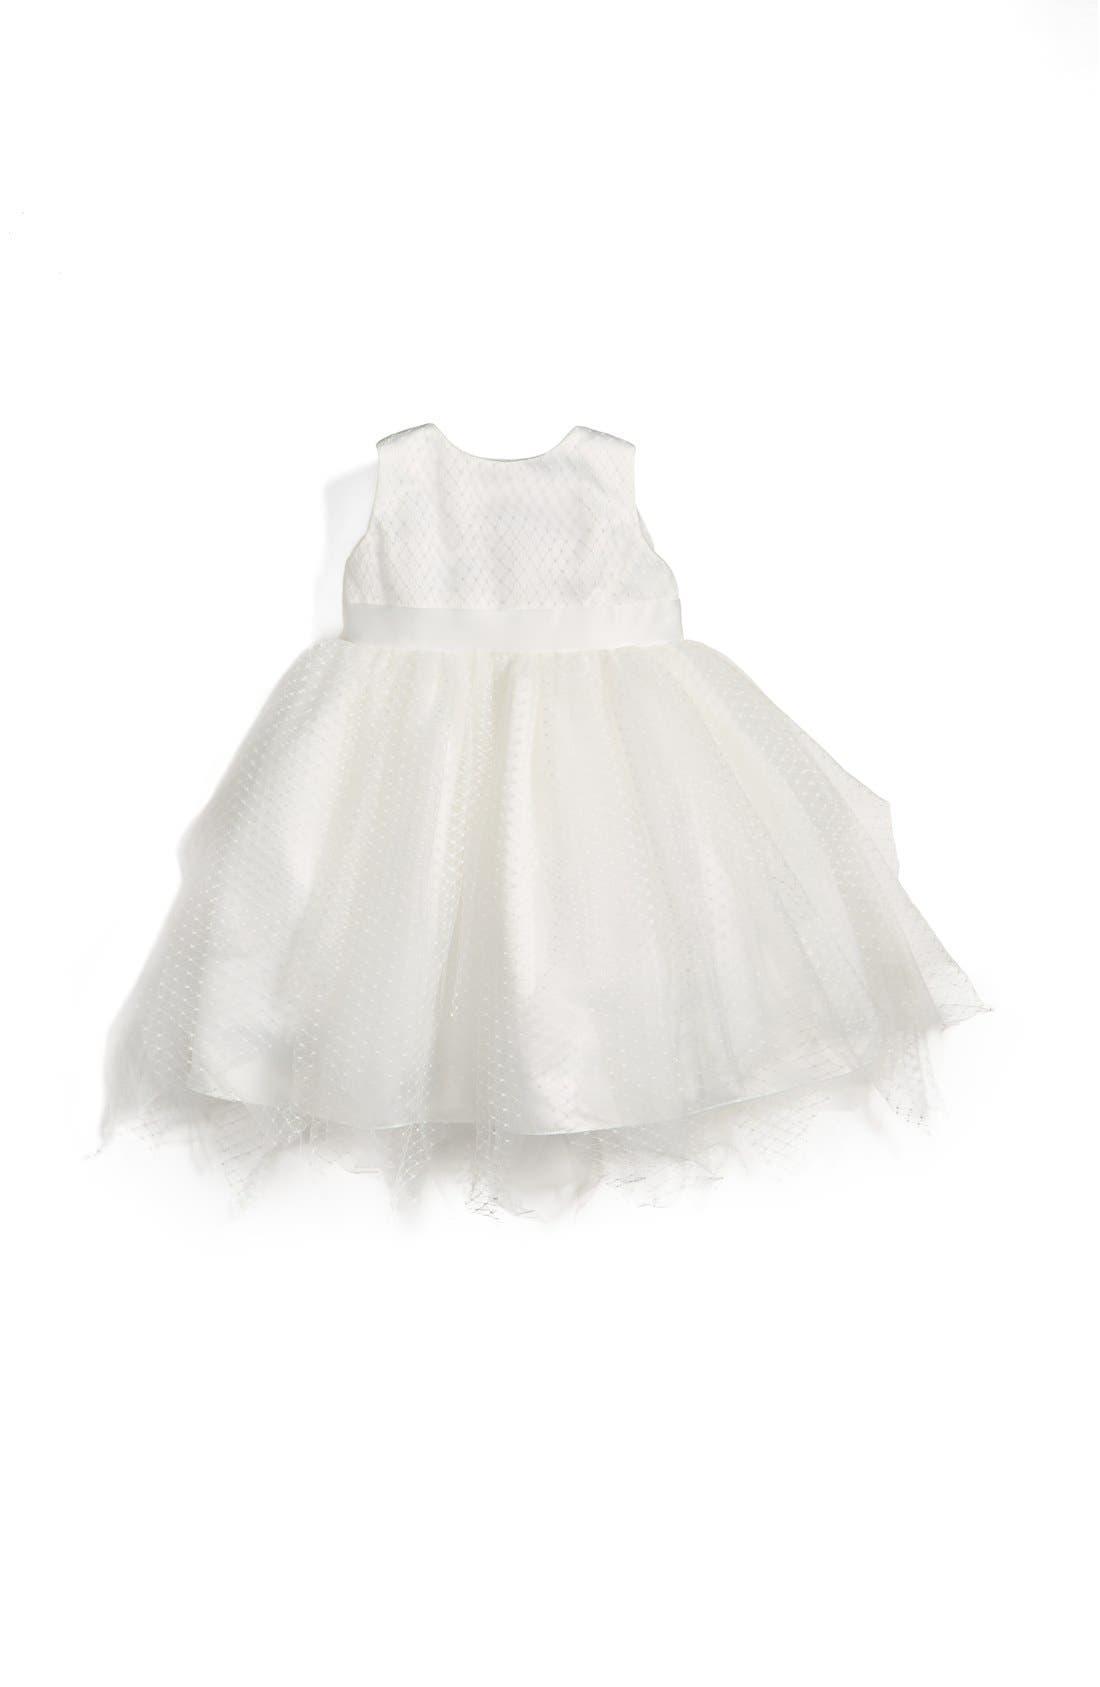 US ANGELS Tulle Overlay Sleeveless Dress